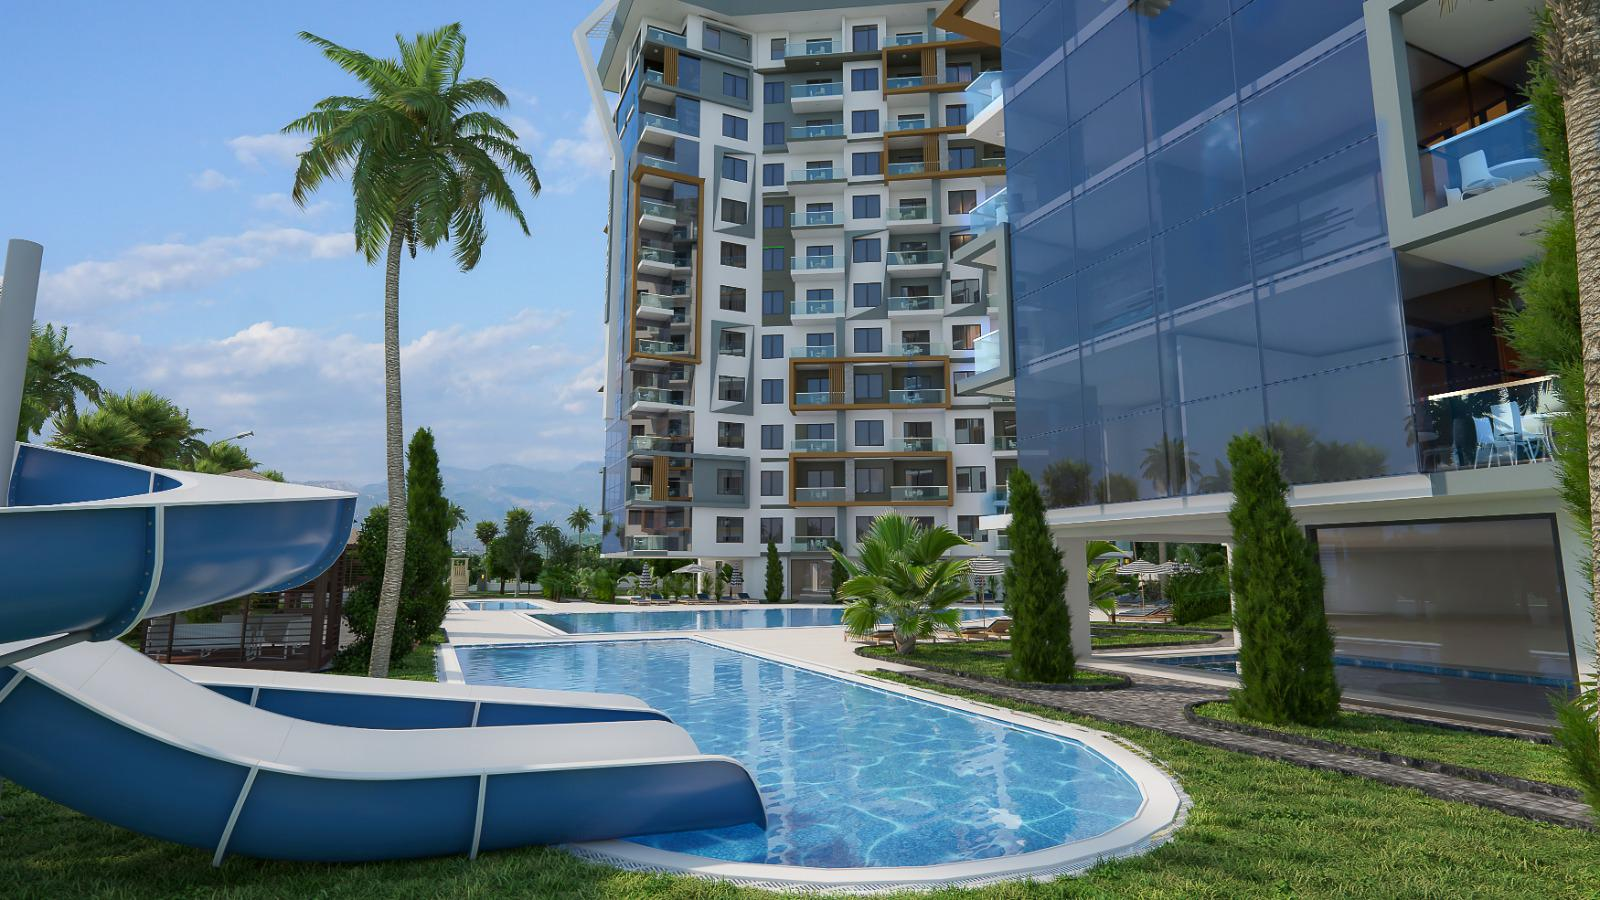 Квартиры и пентхаусы в комплексе с богатой инфраструктурой район Махмутлар - Фото 8